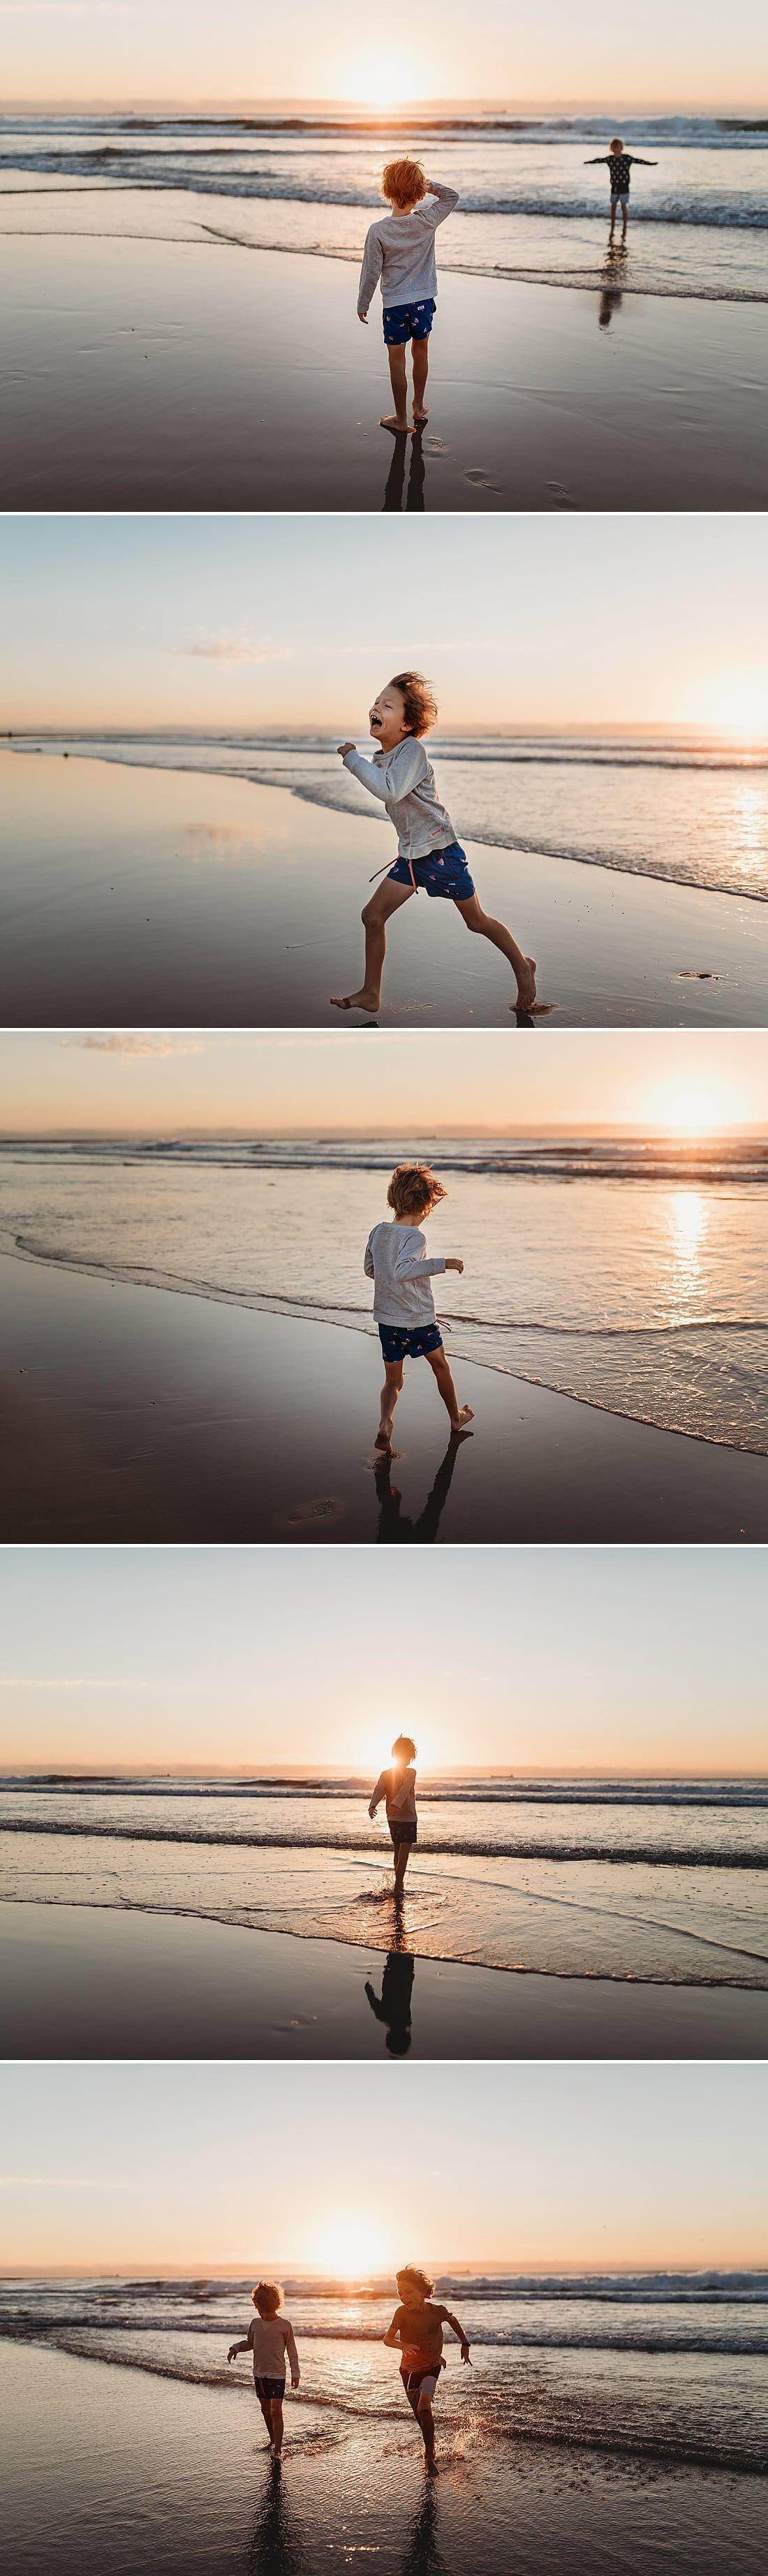 Sunrise-lifestyle-family-photography-beach-session-sutherland-shire